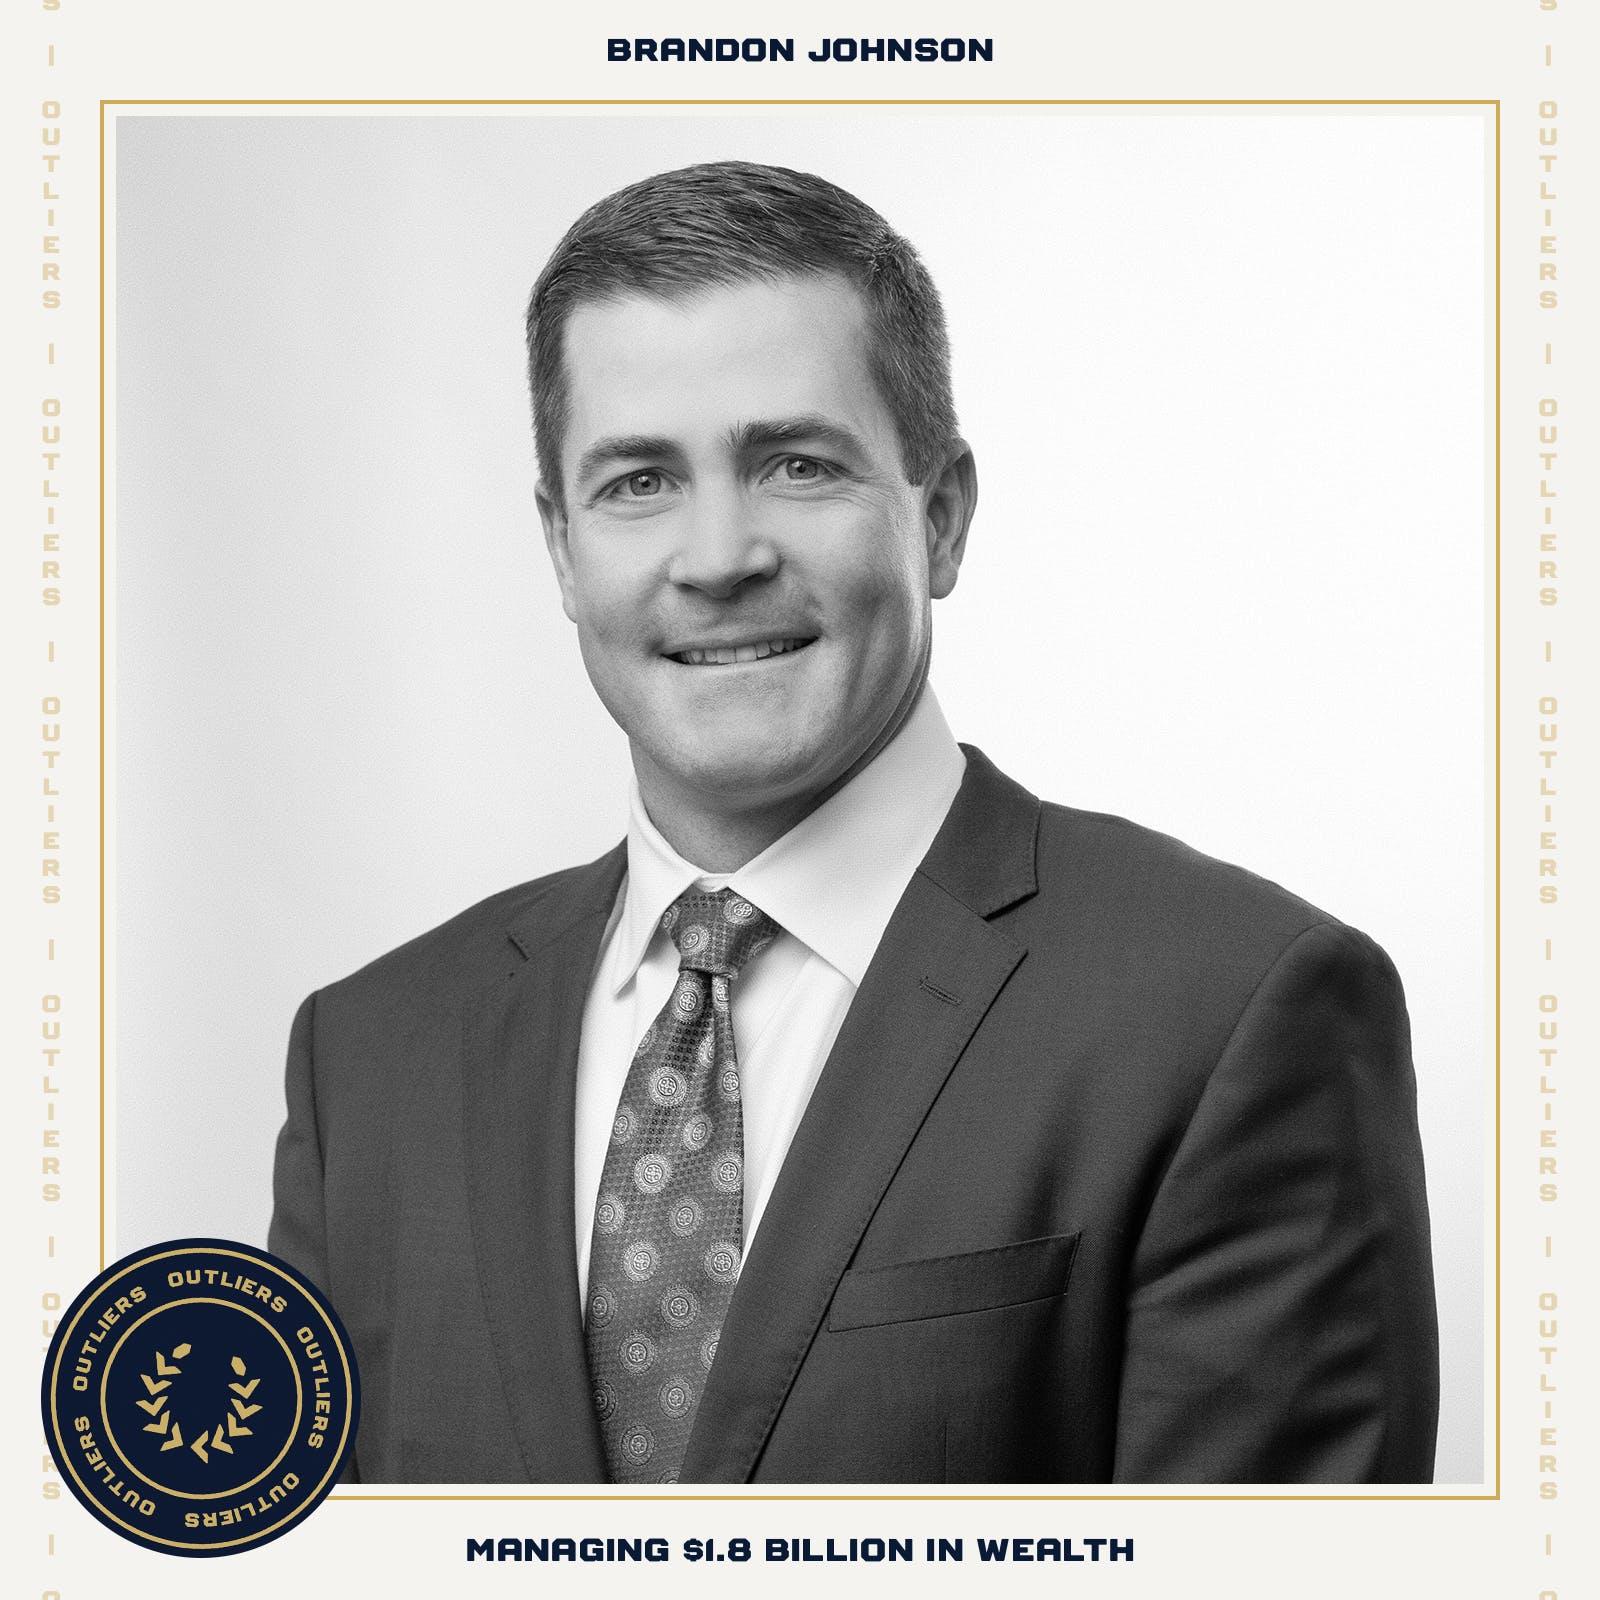 #15 Brandon Johnson: Managing $1.8 Billion in Wealth